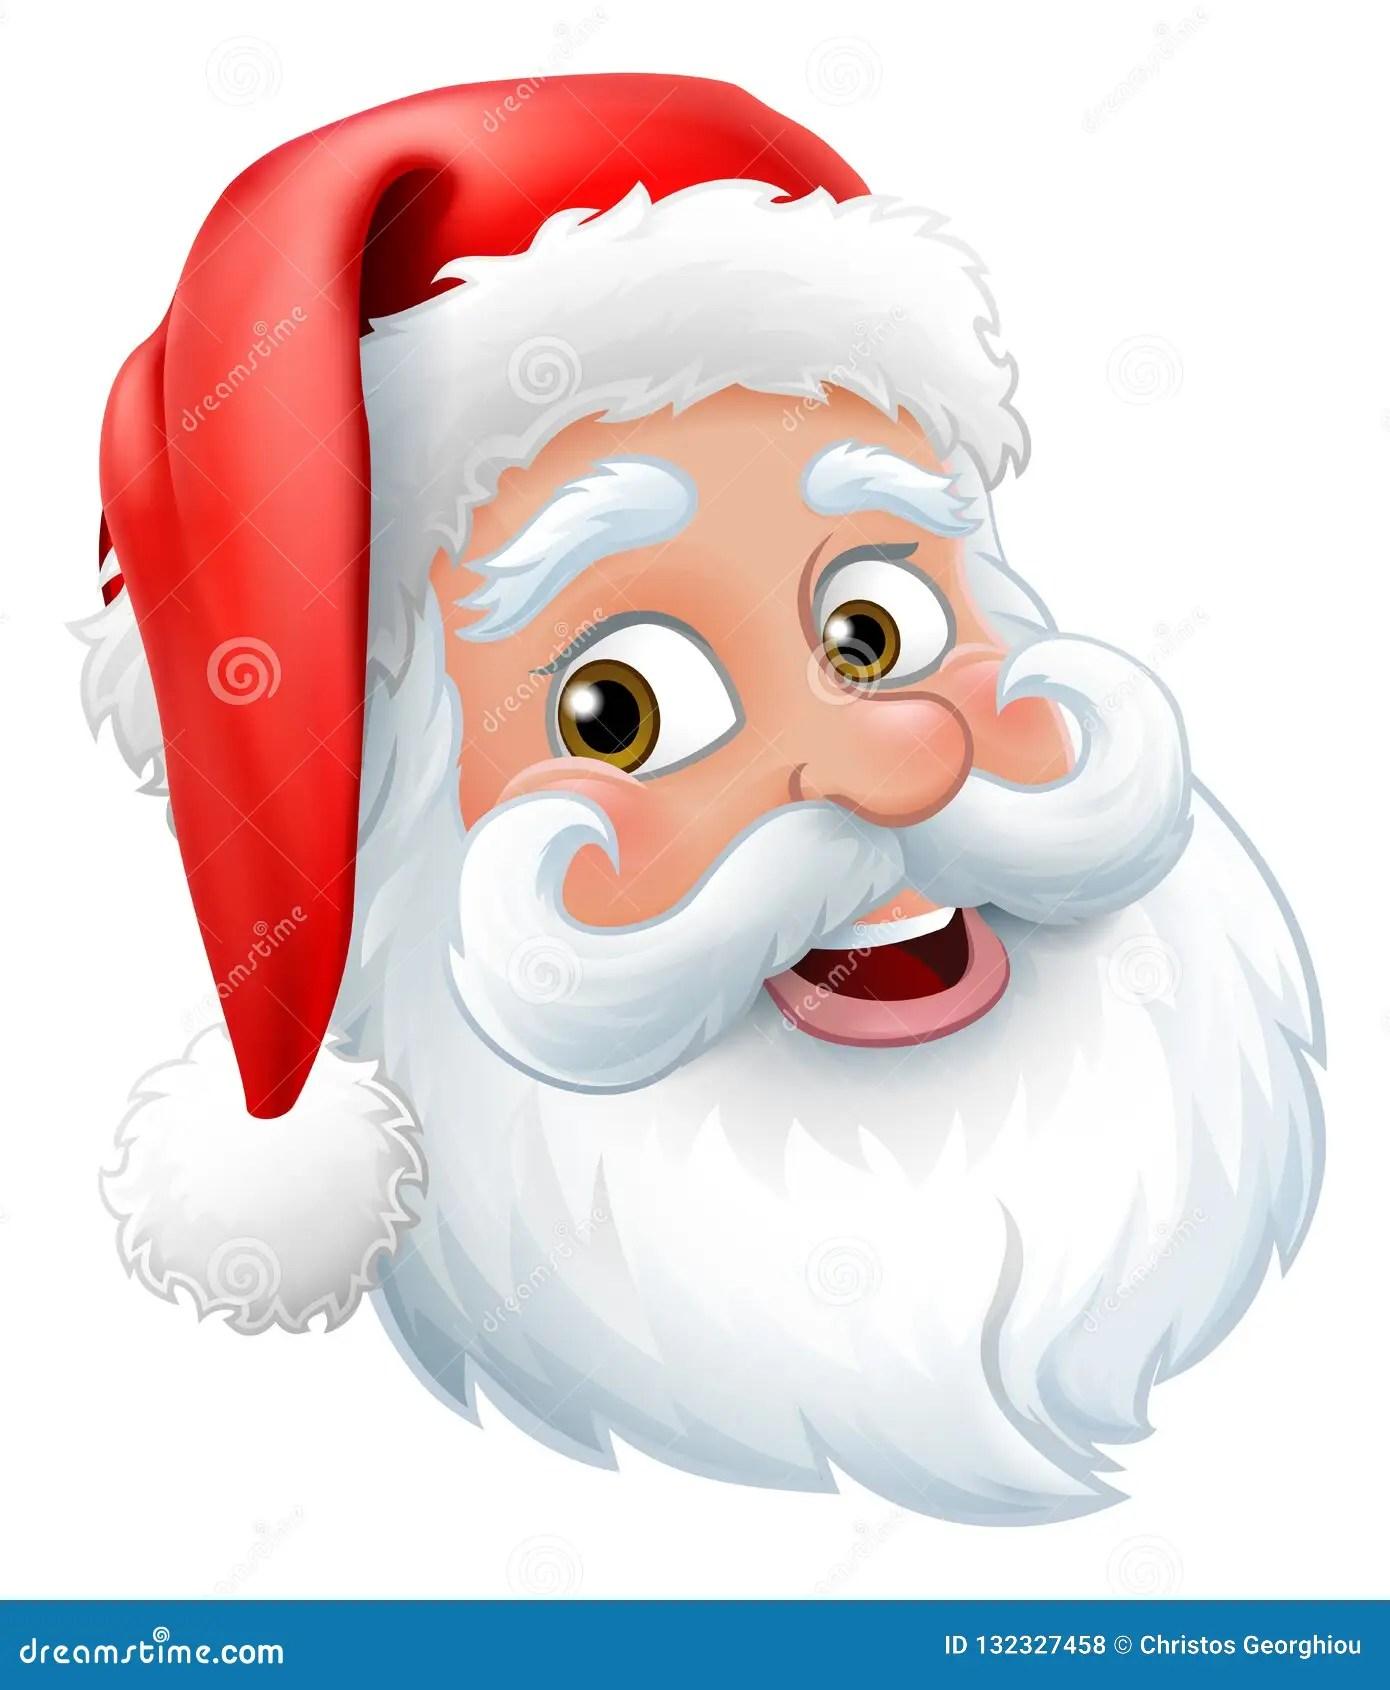 Father Xmas Cartoon Pics : father, cartoon, Father, Christmas, Cartoon, Stock, Illustrations, 13,703, Illustrations,, Vectors, Clipart, Dreamstime